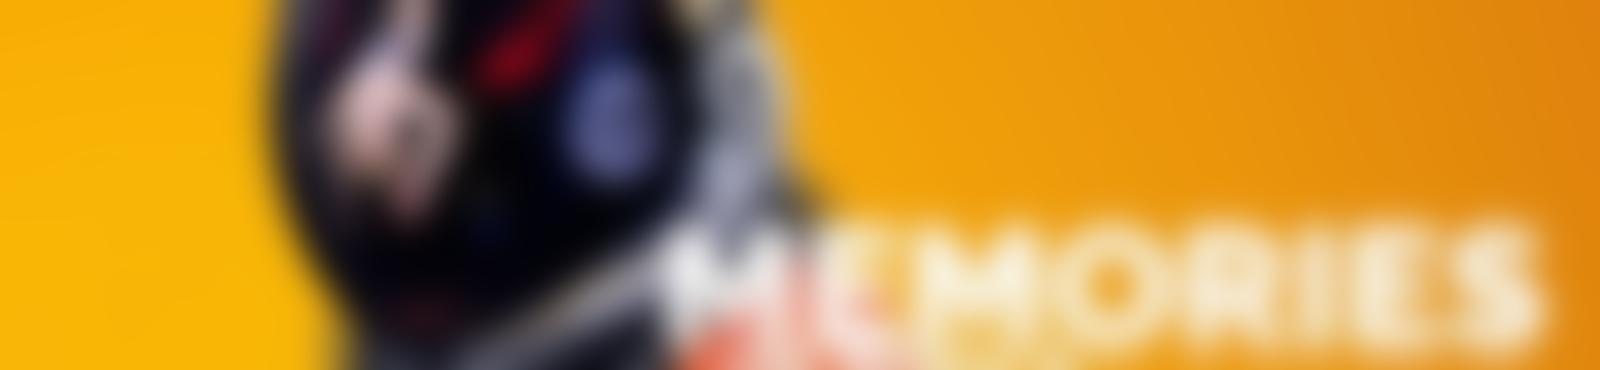 Blurred c04367a5 6c09 4fa5 9754 8044b08ef94a